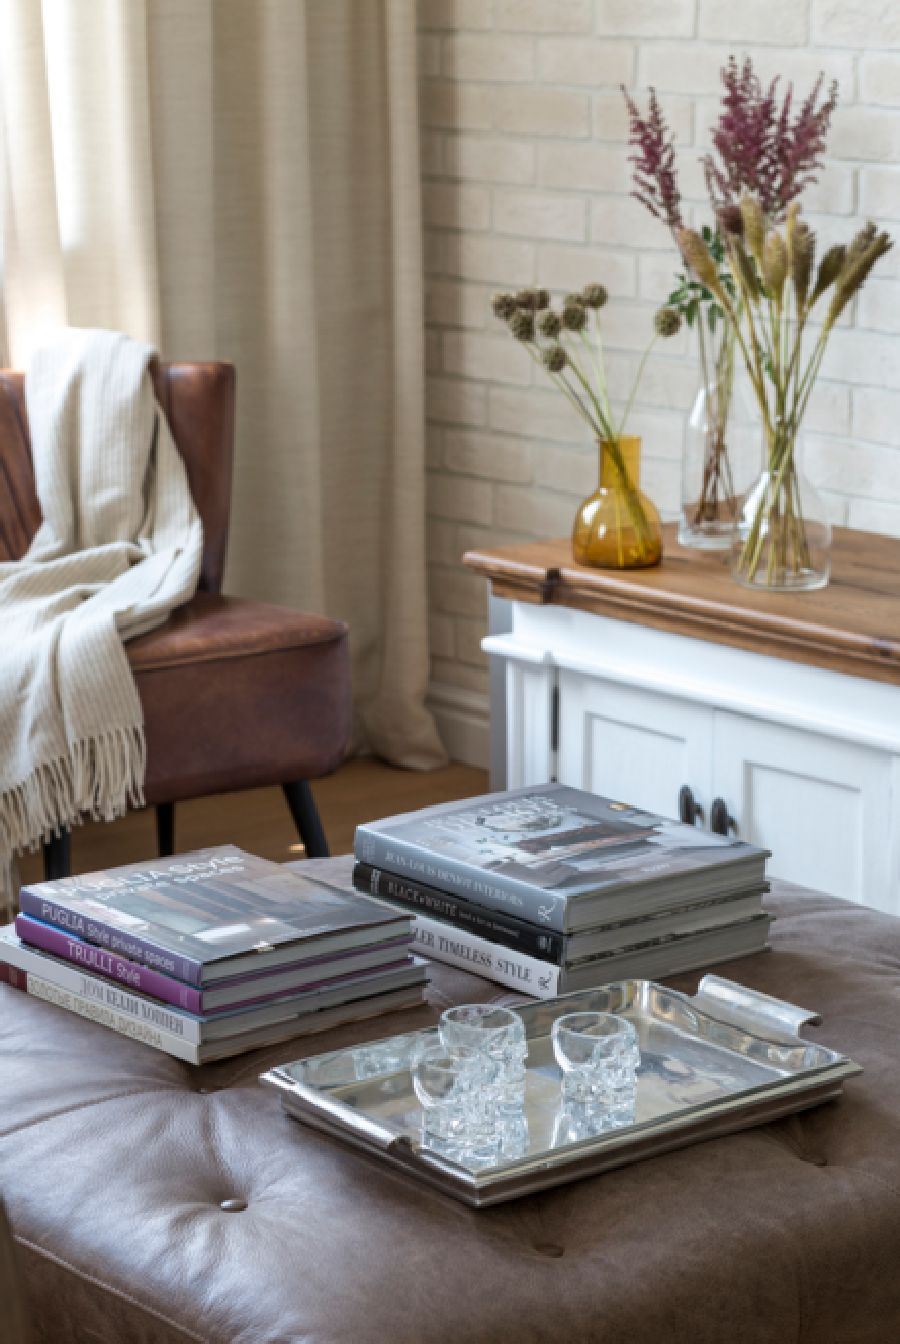 adelaparvu.com despre apartament de 80 mp patrati cu aer rustic elegant, locuinta Rusia, designer Zhenya Zhdanova (8)